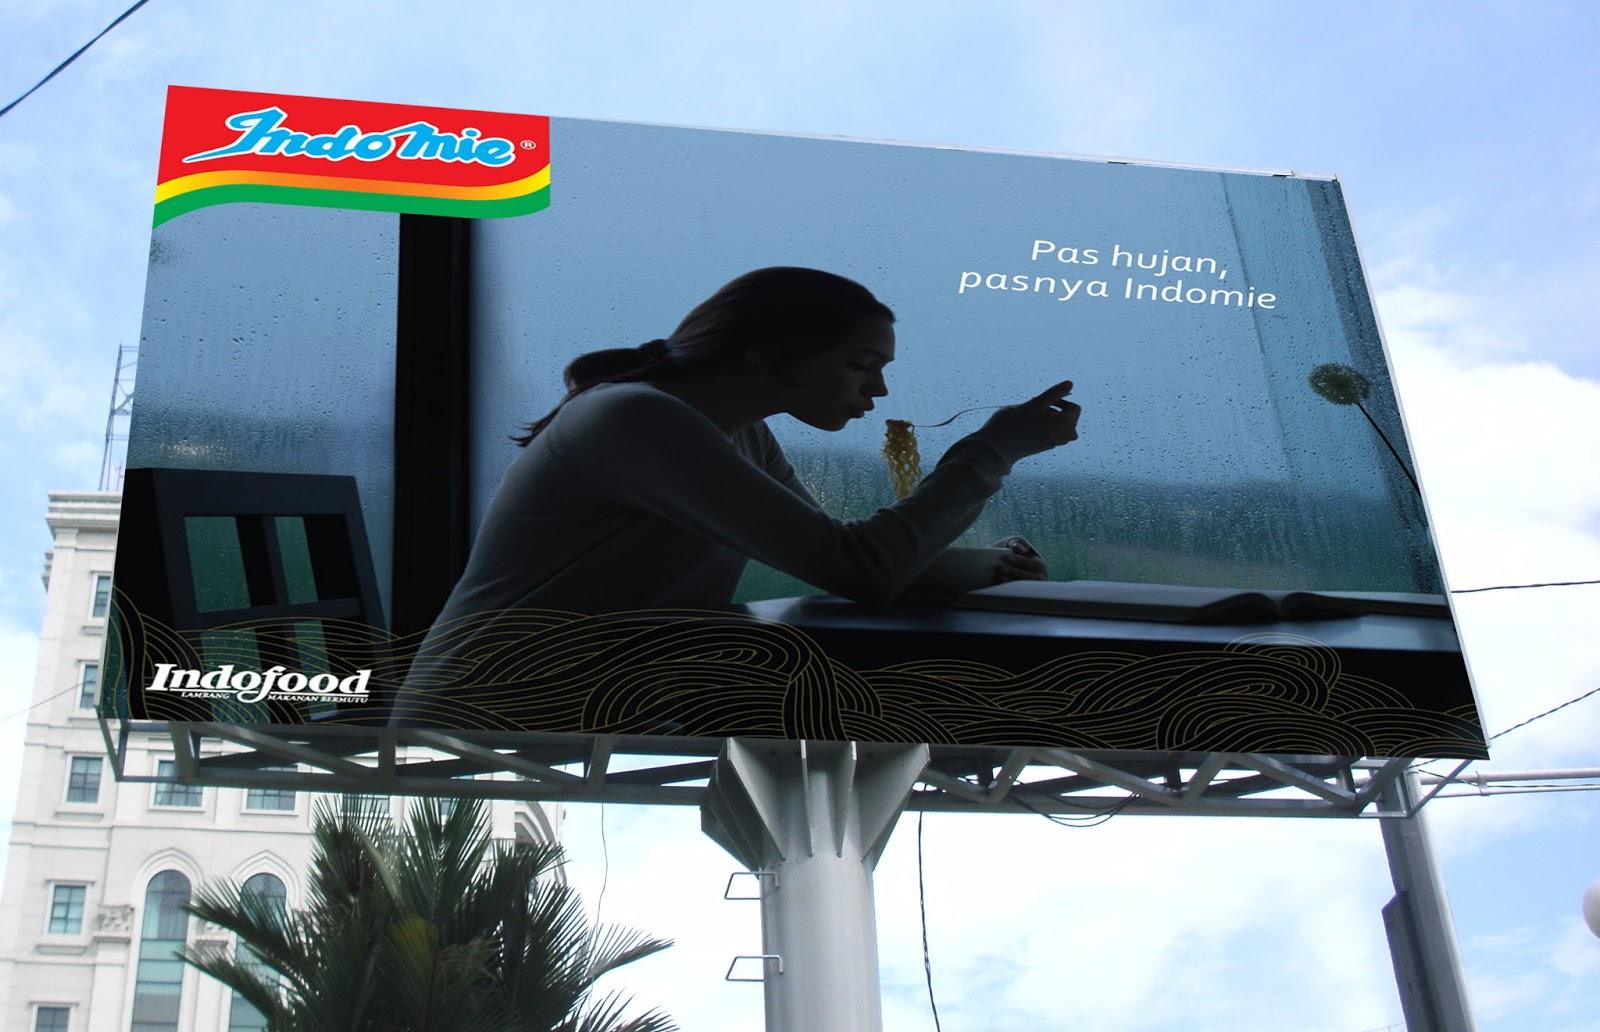 Jual Videotron Tv Billboard Led Display Reklame